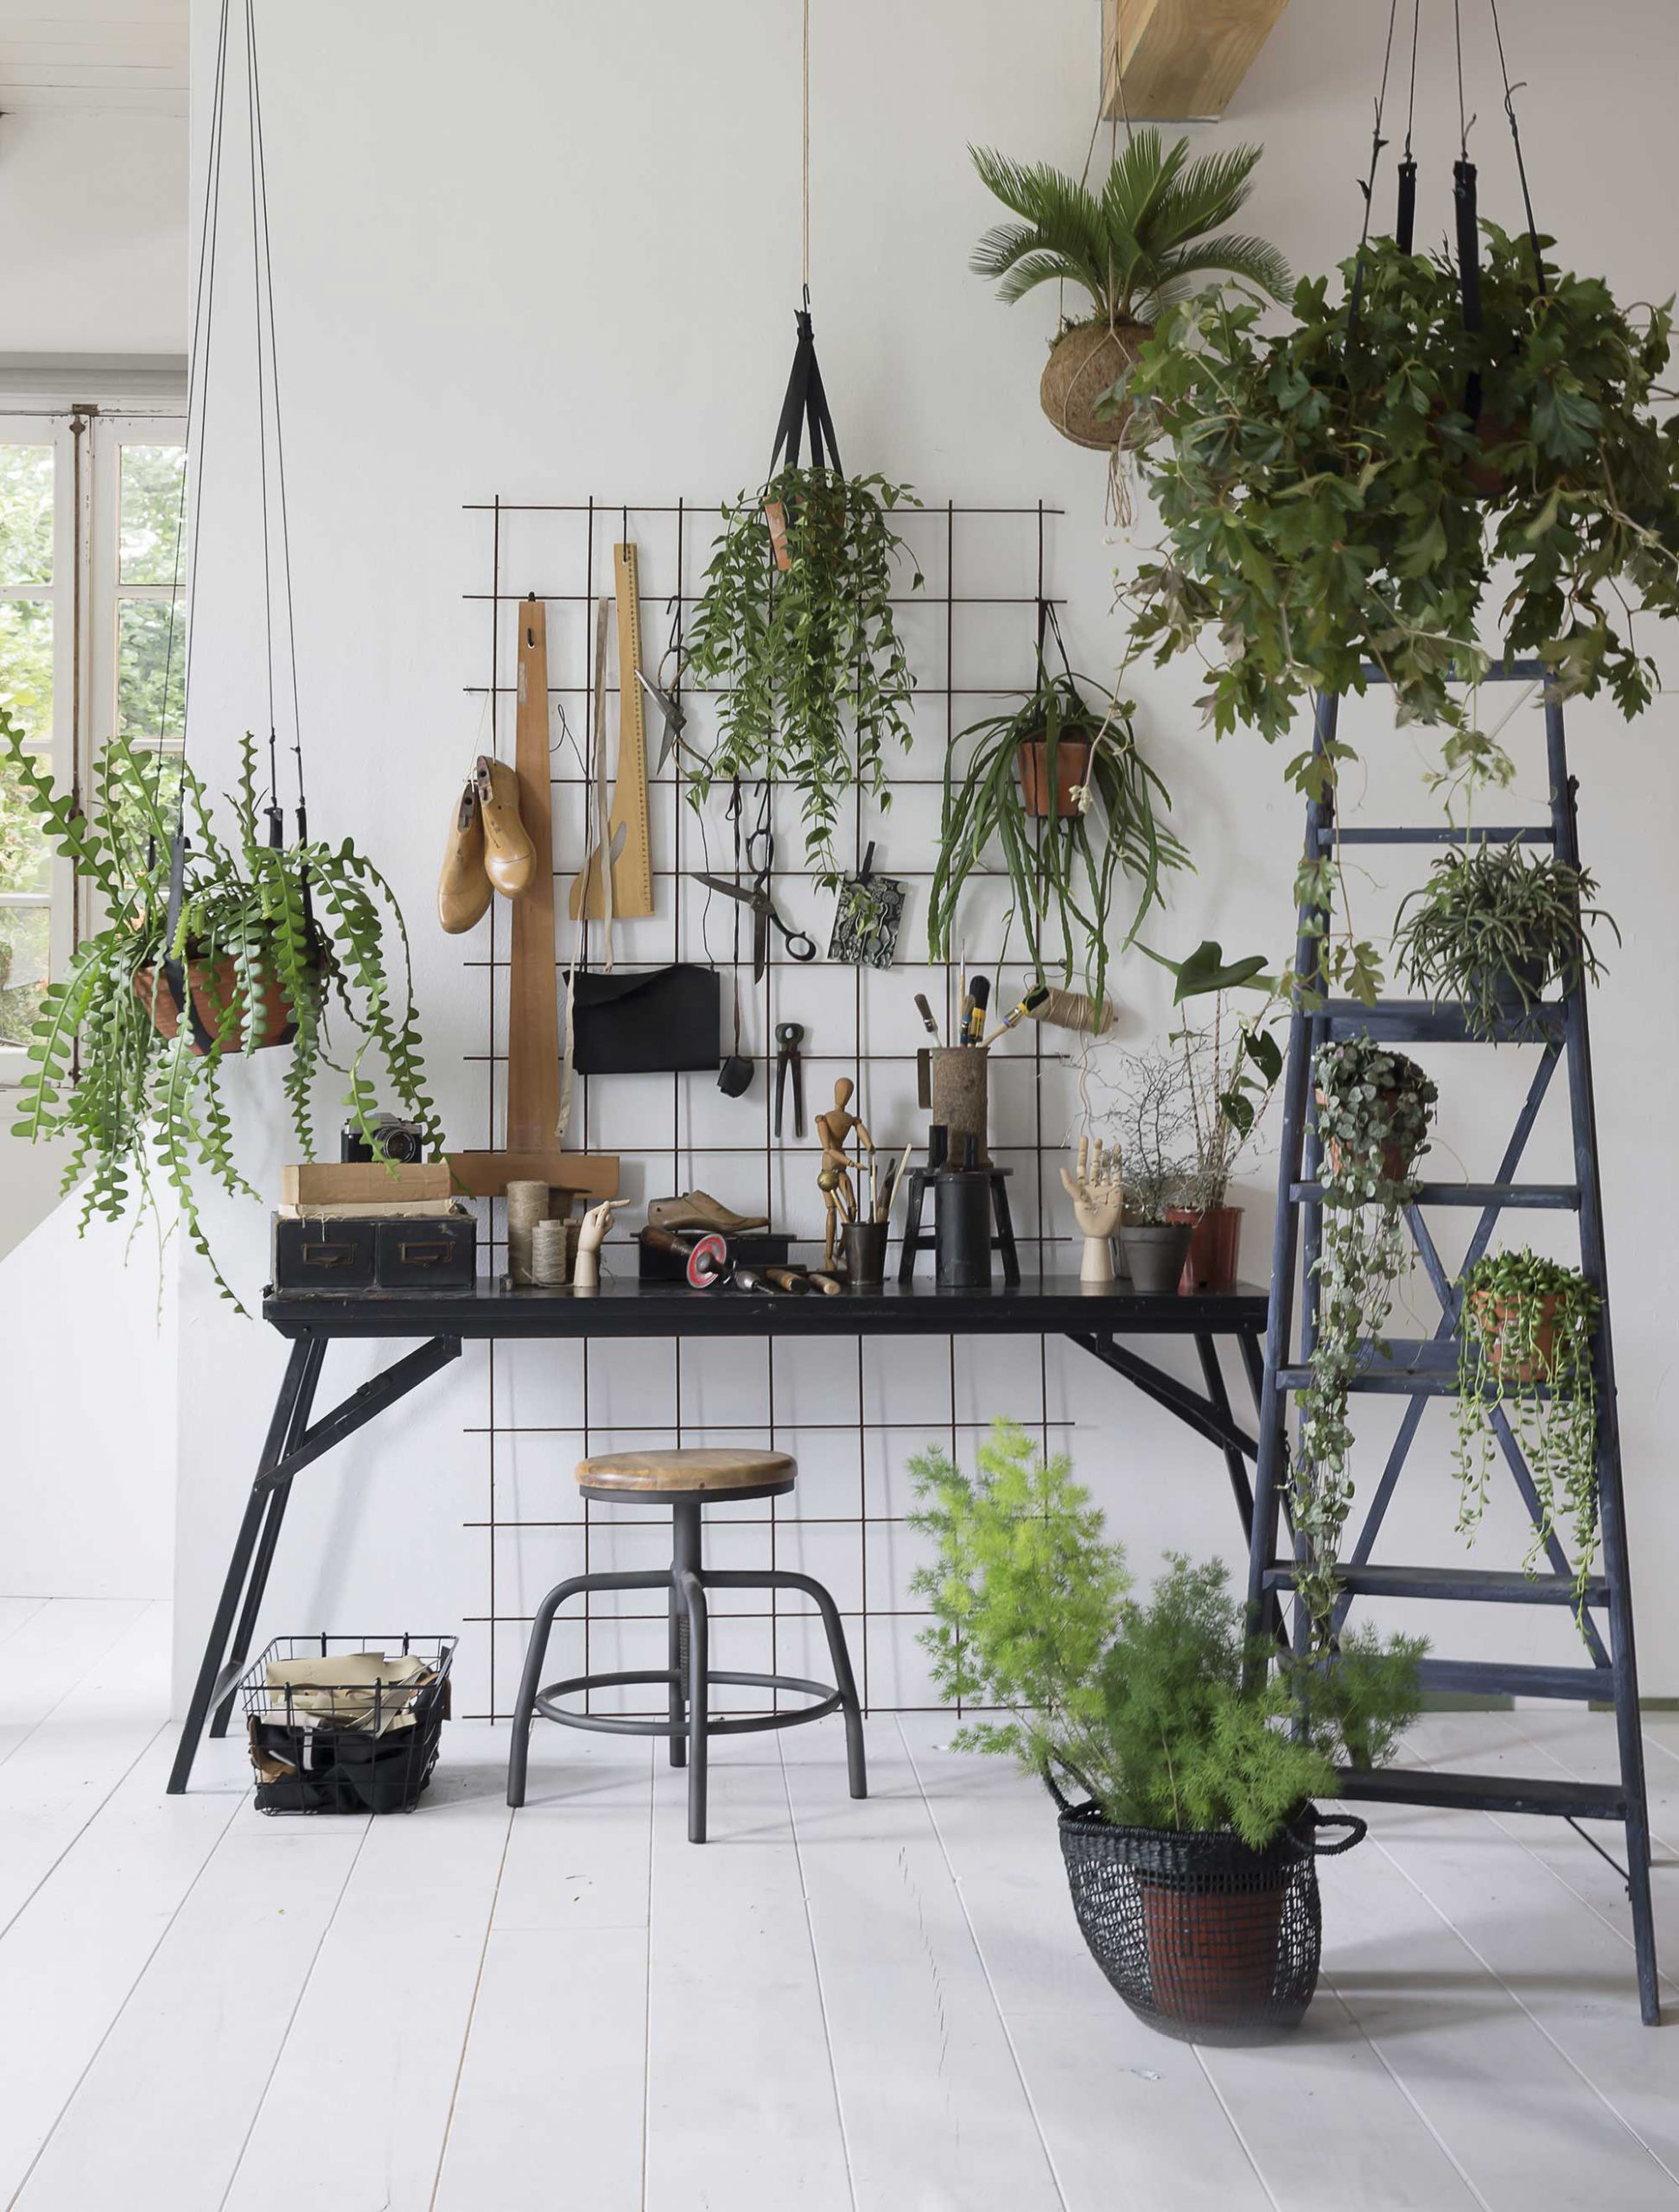 Grote Groene Planten In Je Interieur 100 Woongeluk